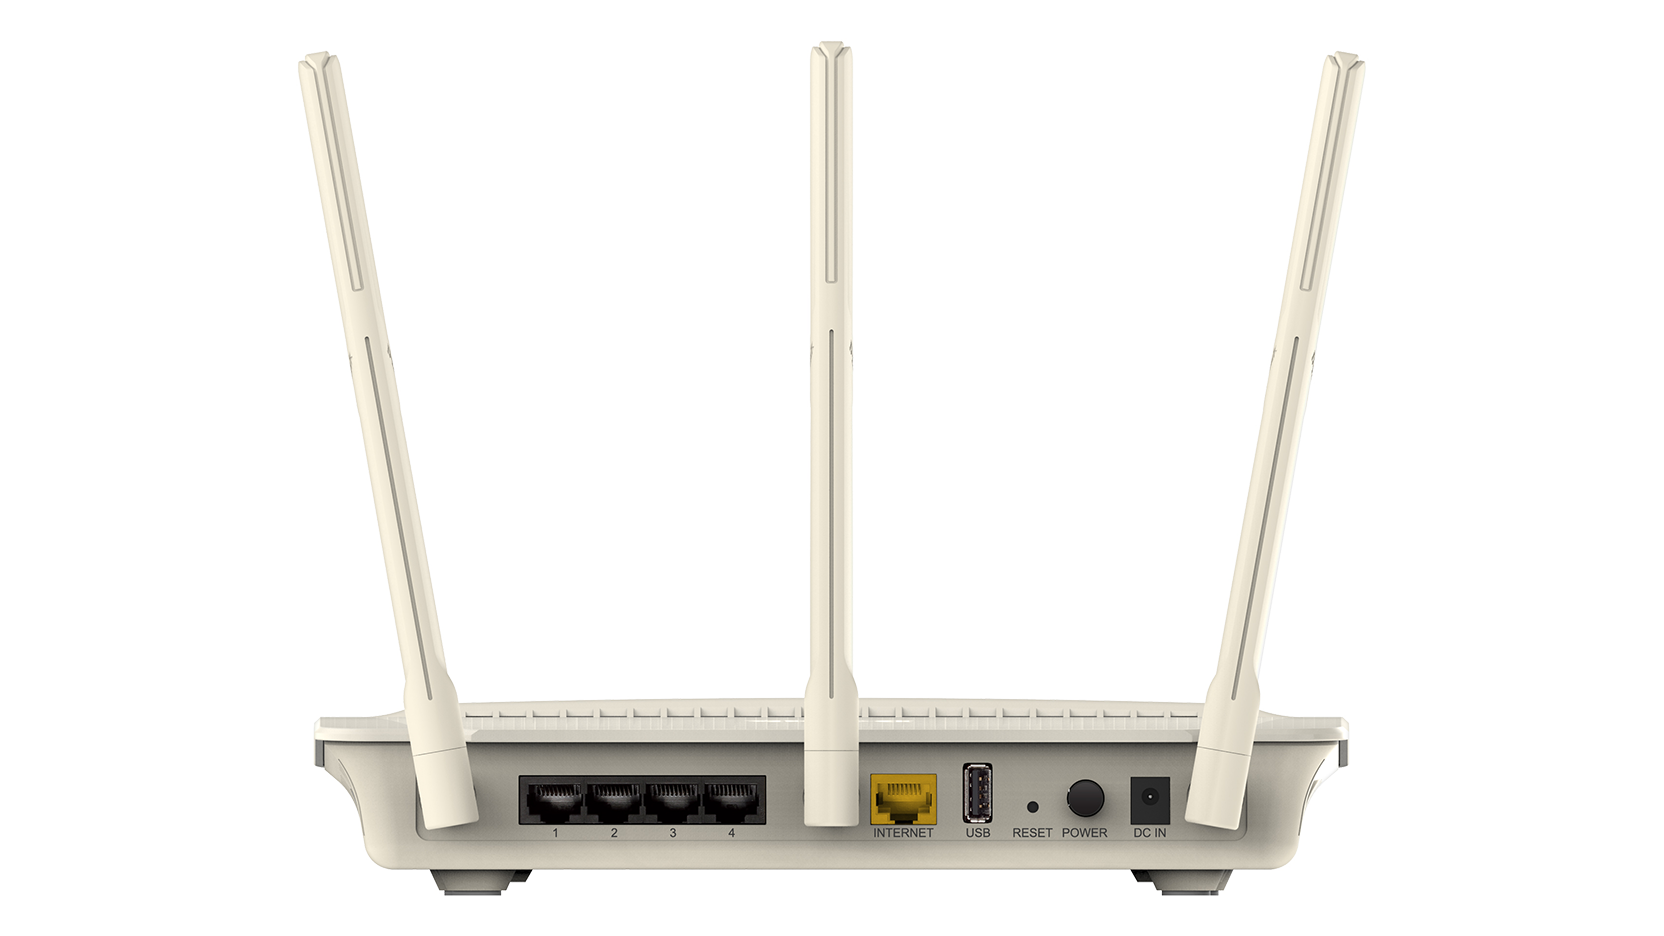 DIR 880L Wireless AC1900 Dual Band